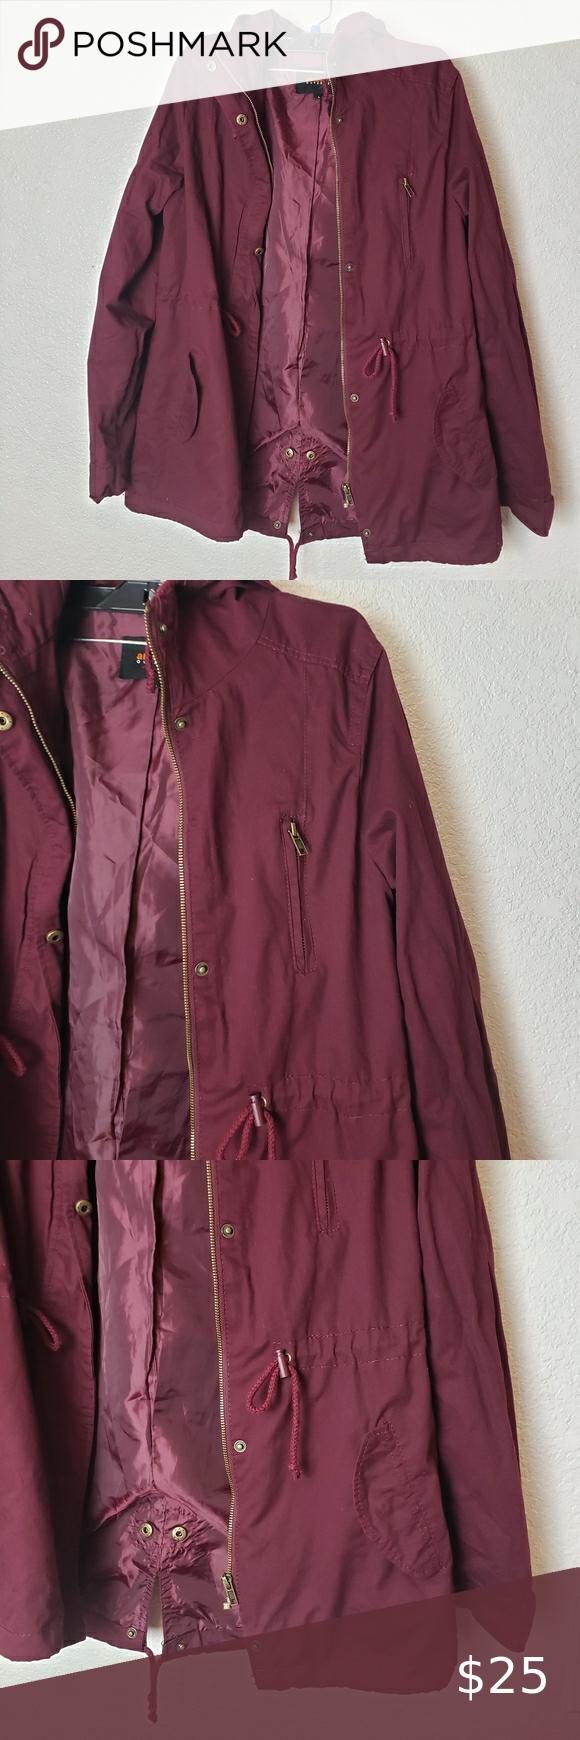 Ambiance Outwear Burgundy Utility Jacket Clothes Design Burgundy Jacket Jackets [ 1740 x 580 Pixel ]